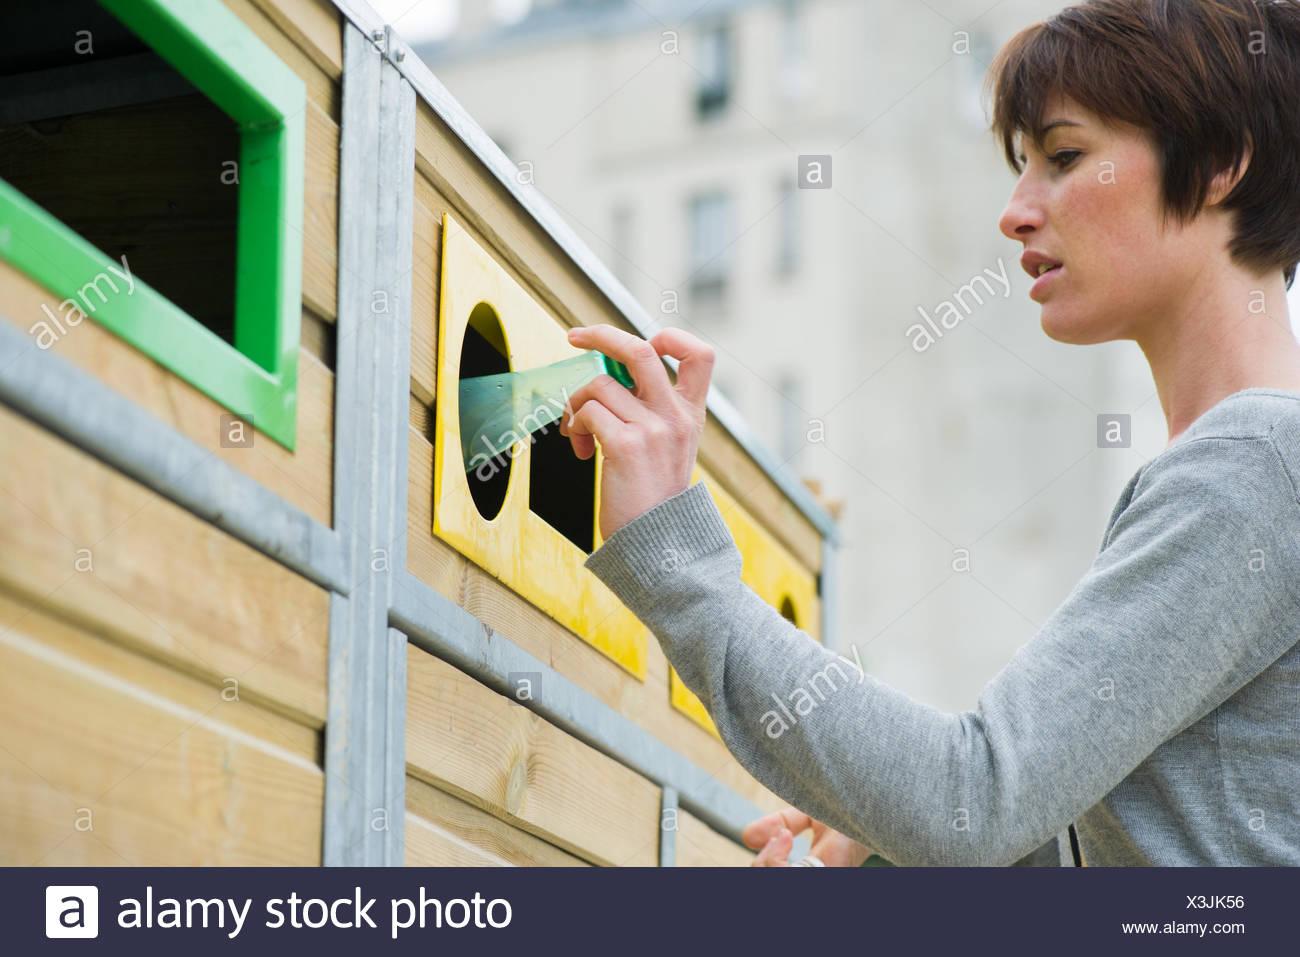 Frau Plastikflasche in Recyclingbehälter platzieren Stockbild